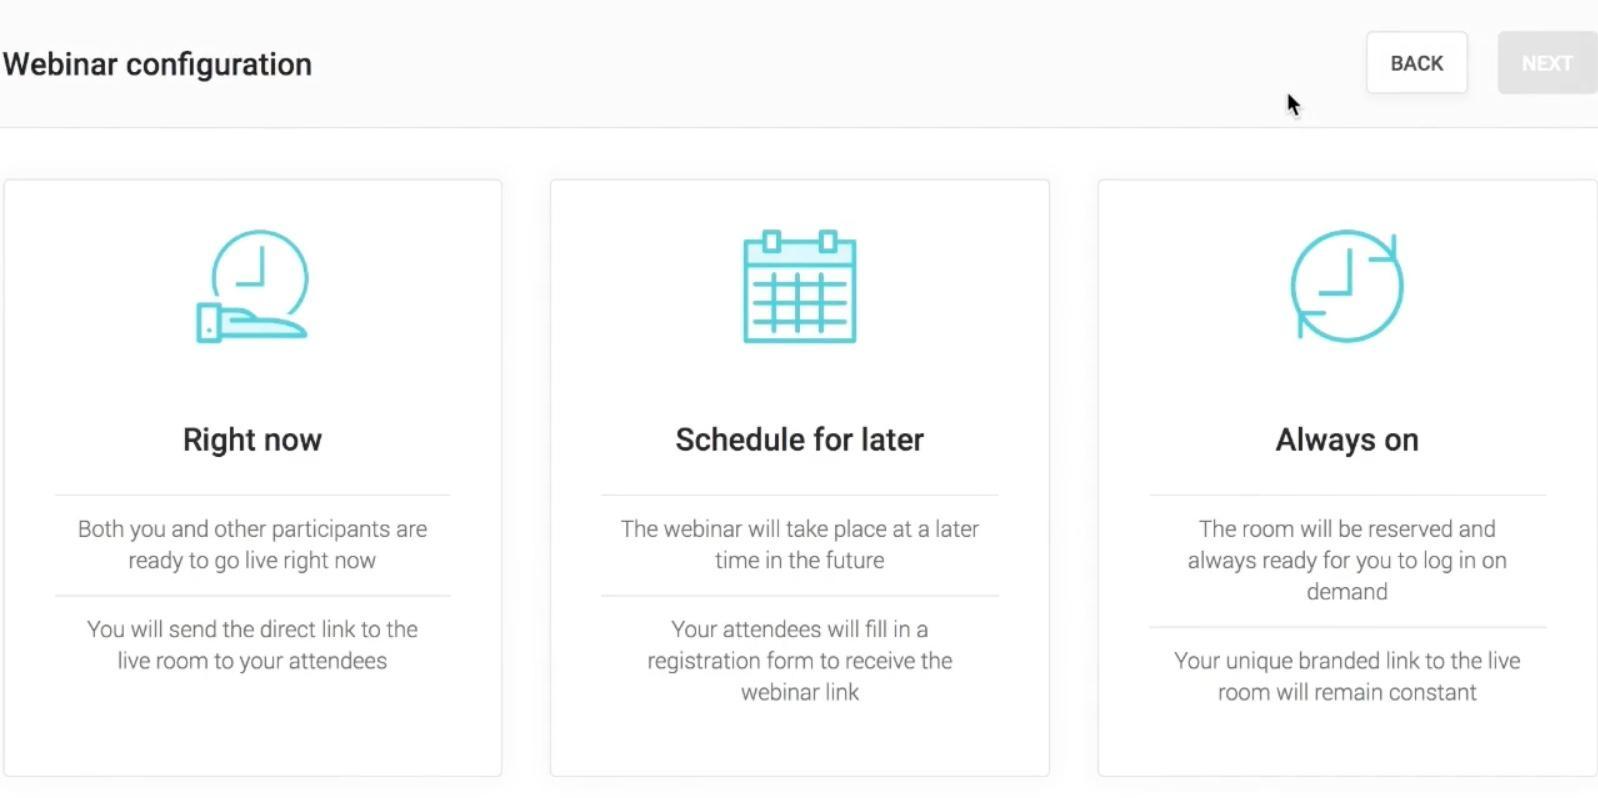 WebinarJam Webinar Configuration